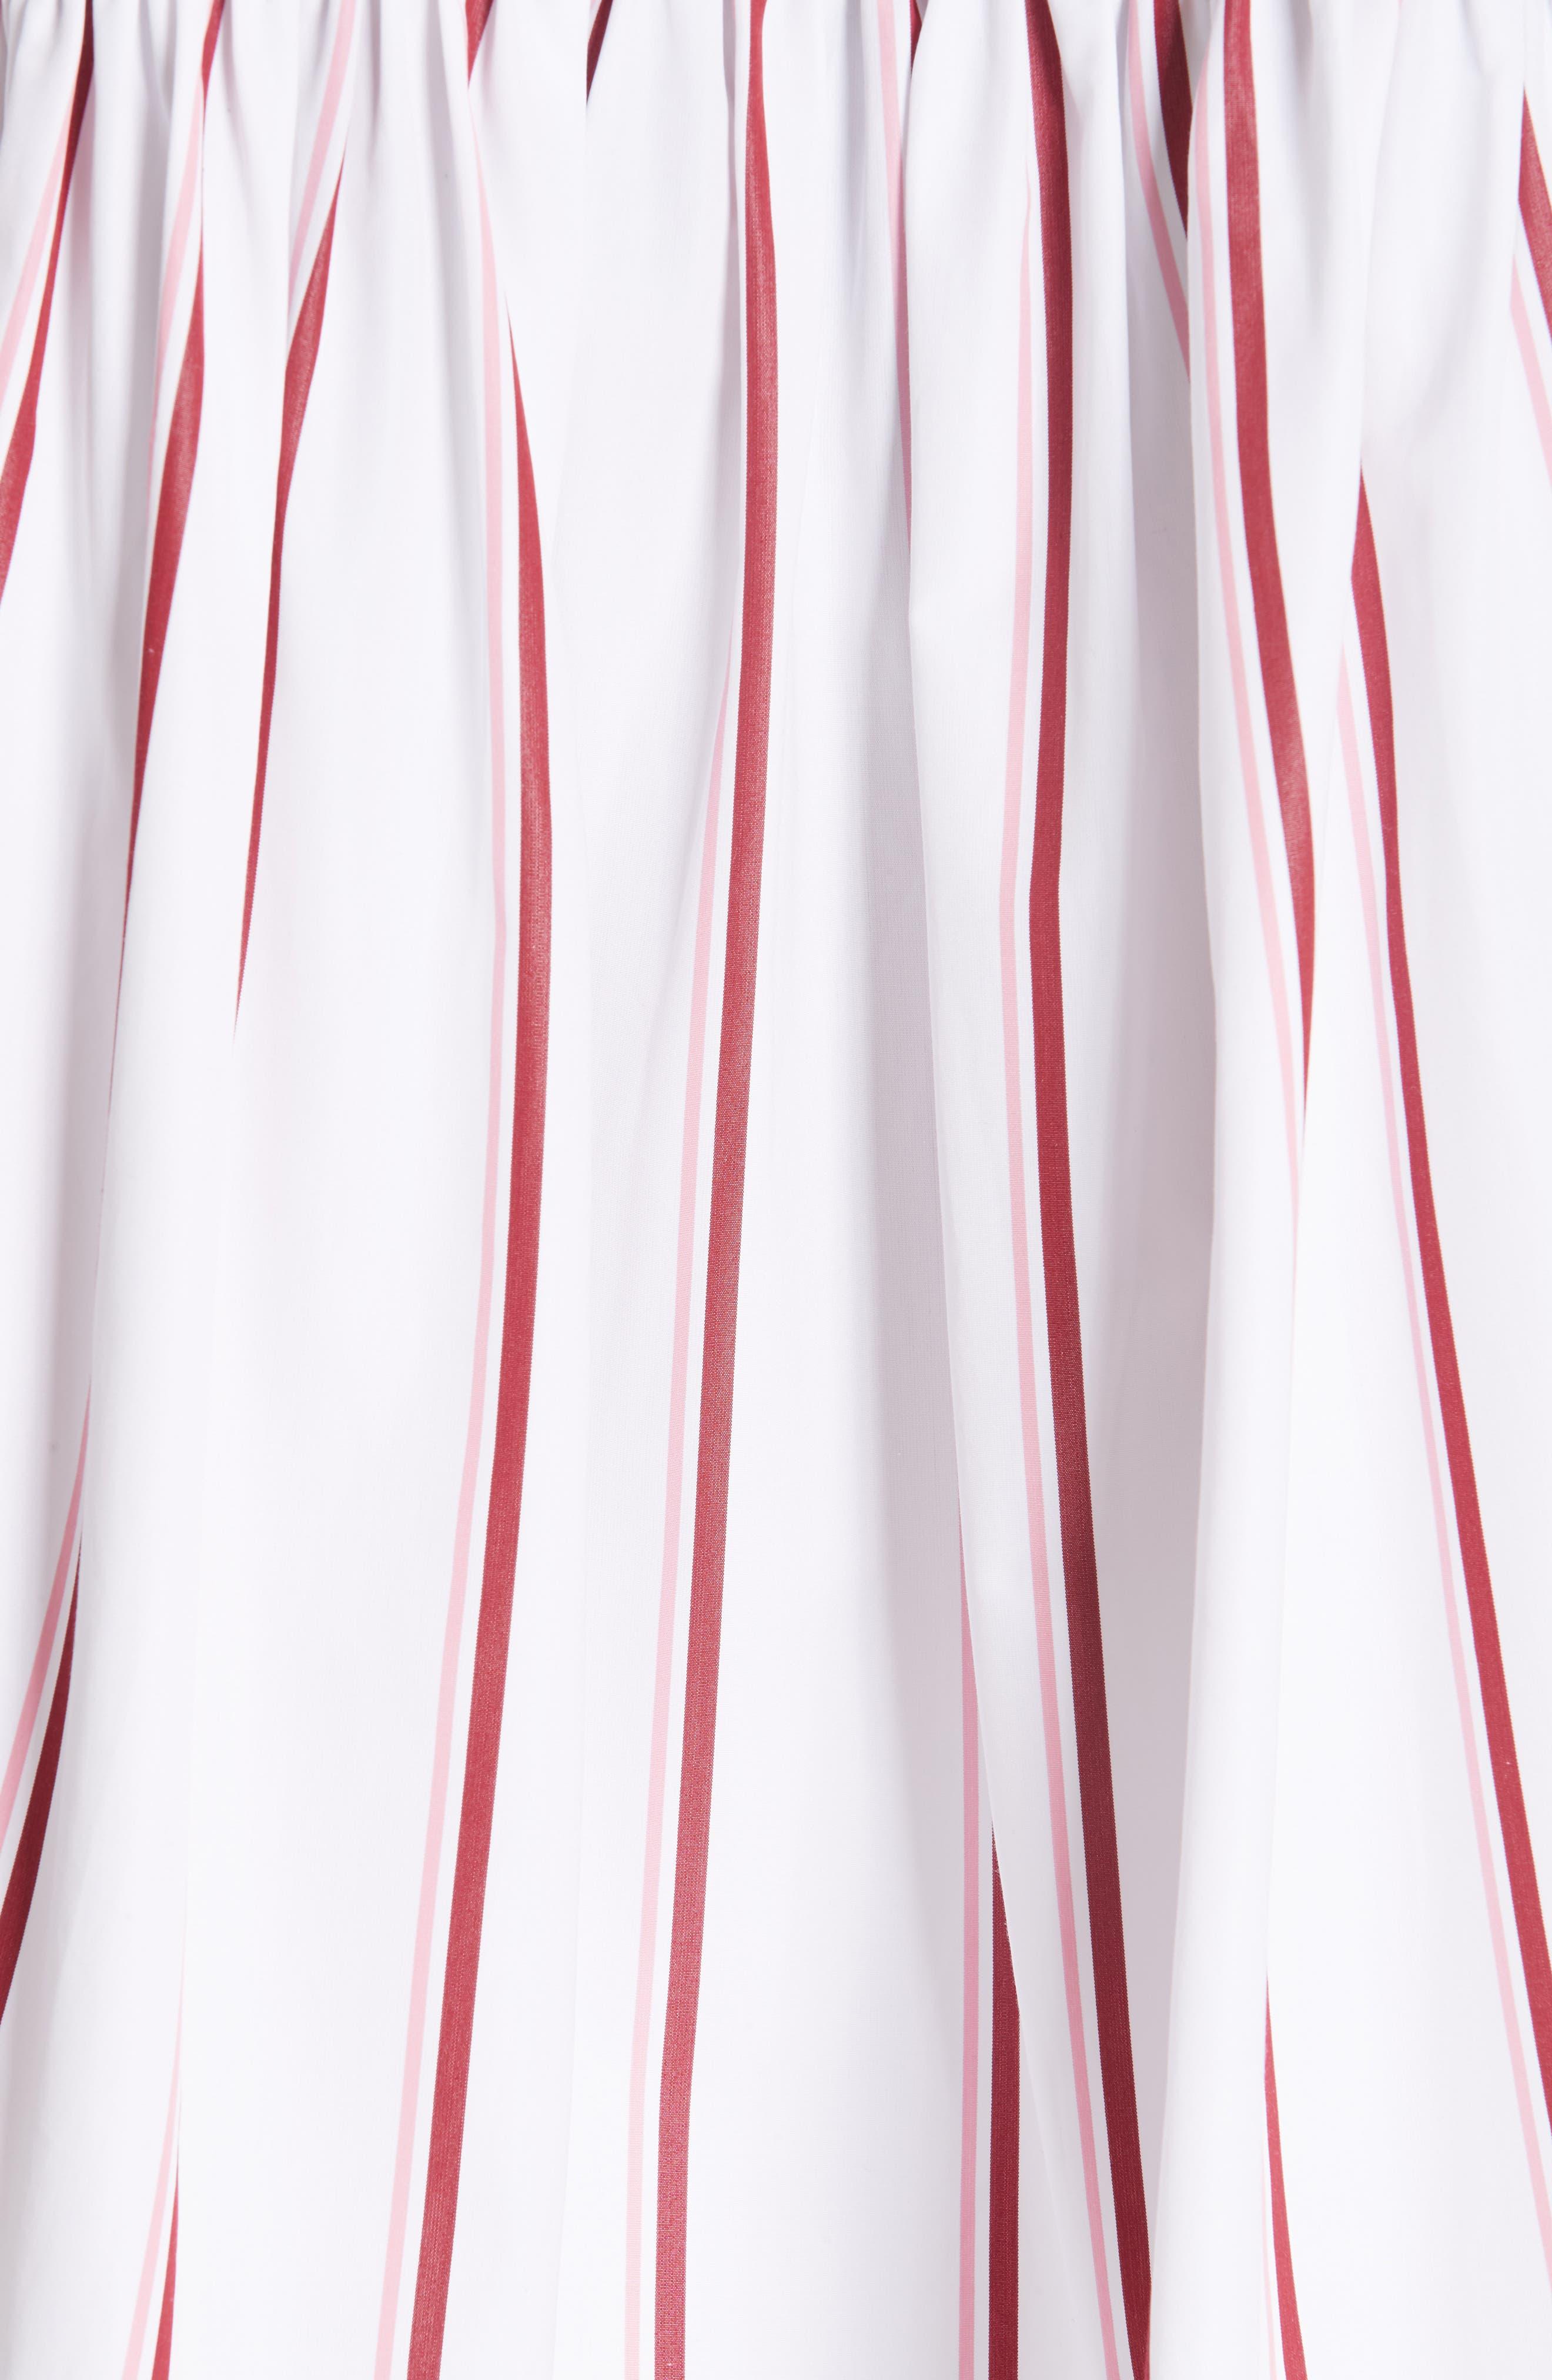 CALVIN KLEIN 205W39NYC, Tie Neck Cotton Poplin Blouse, Alternate thumbnail 6, color, OPTIC WHITE CAMEO PINK